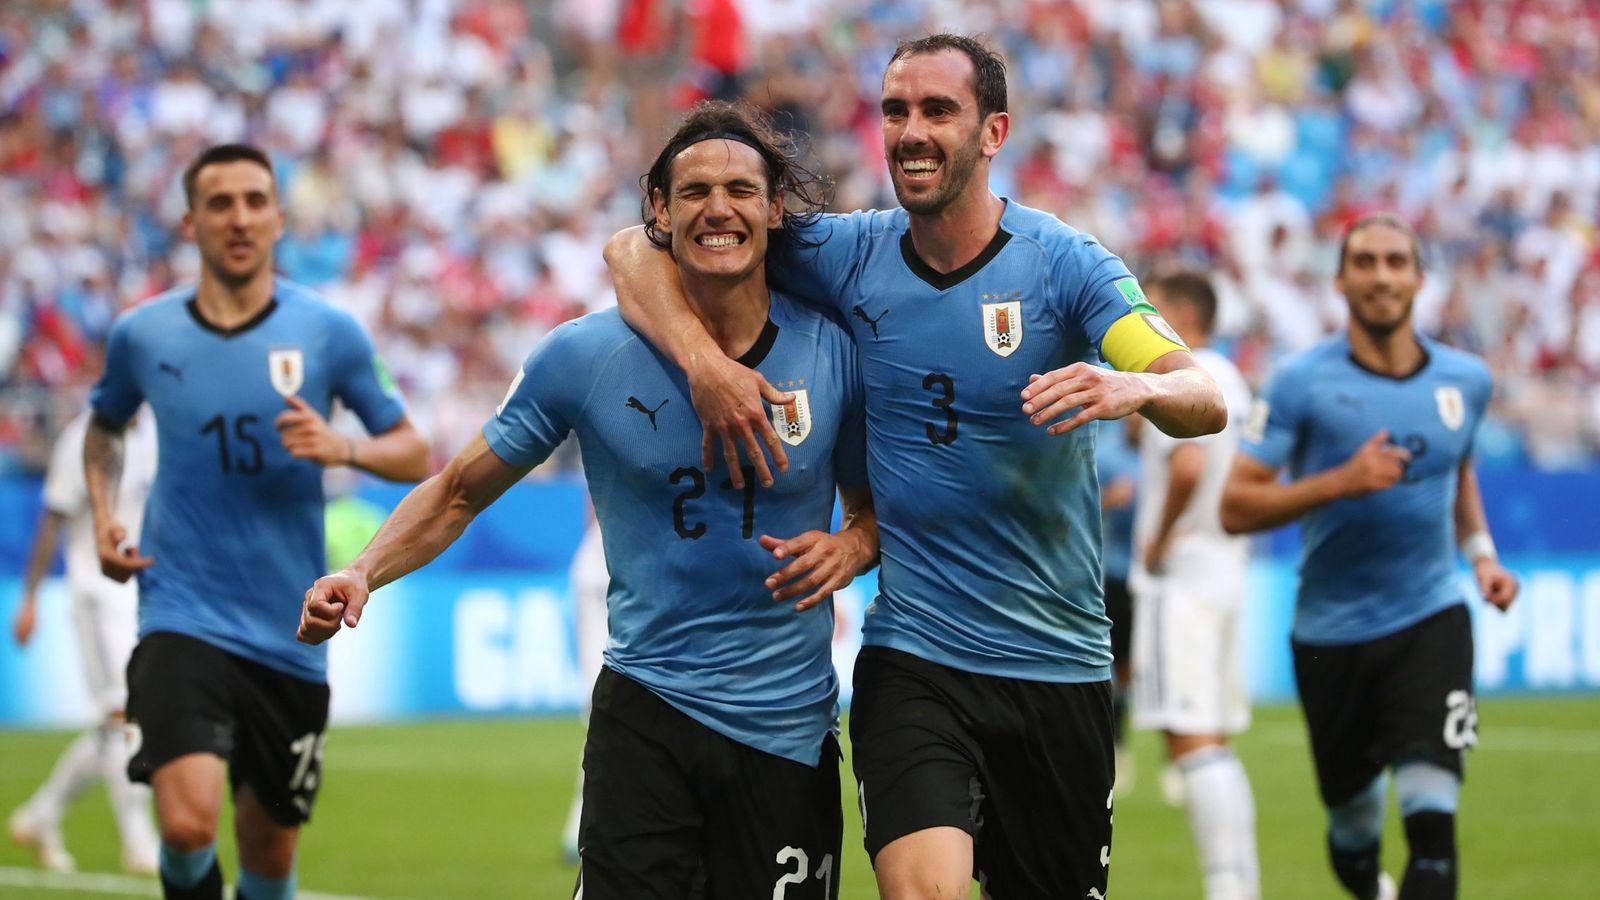 Foto: World cup - group a - uruguay vs russia